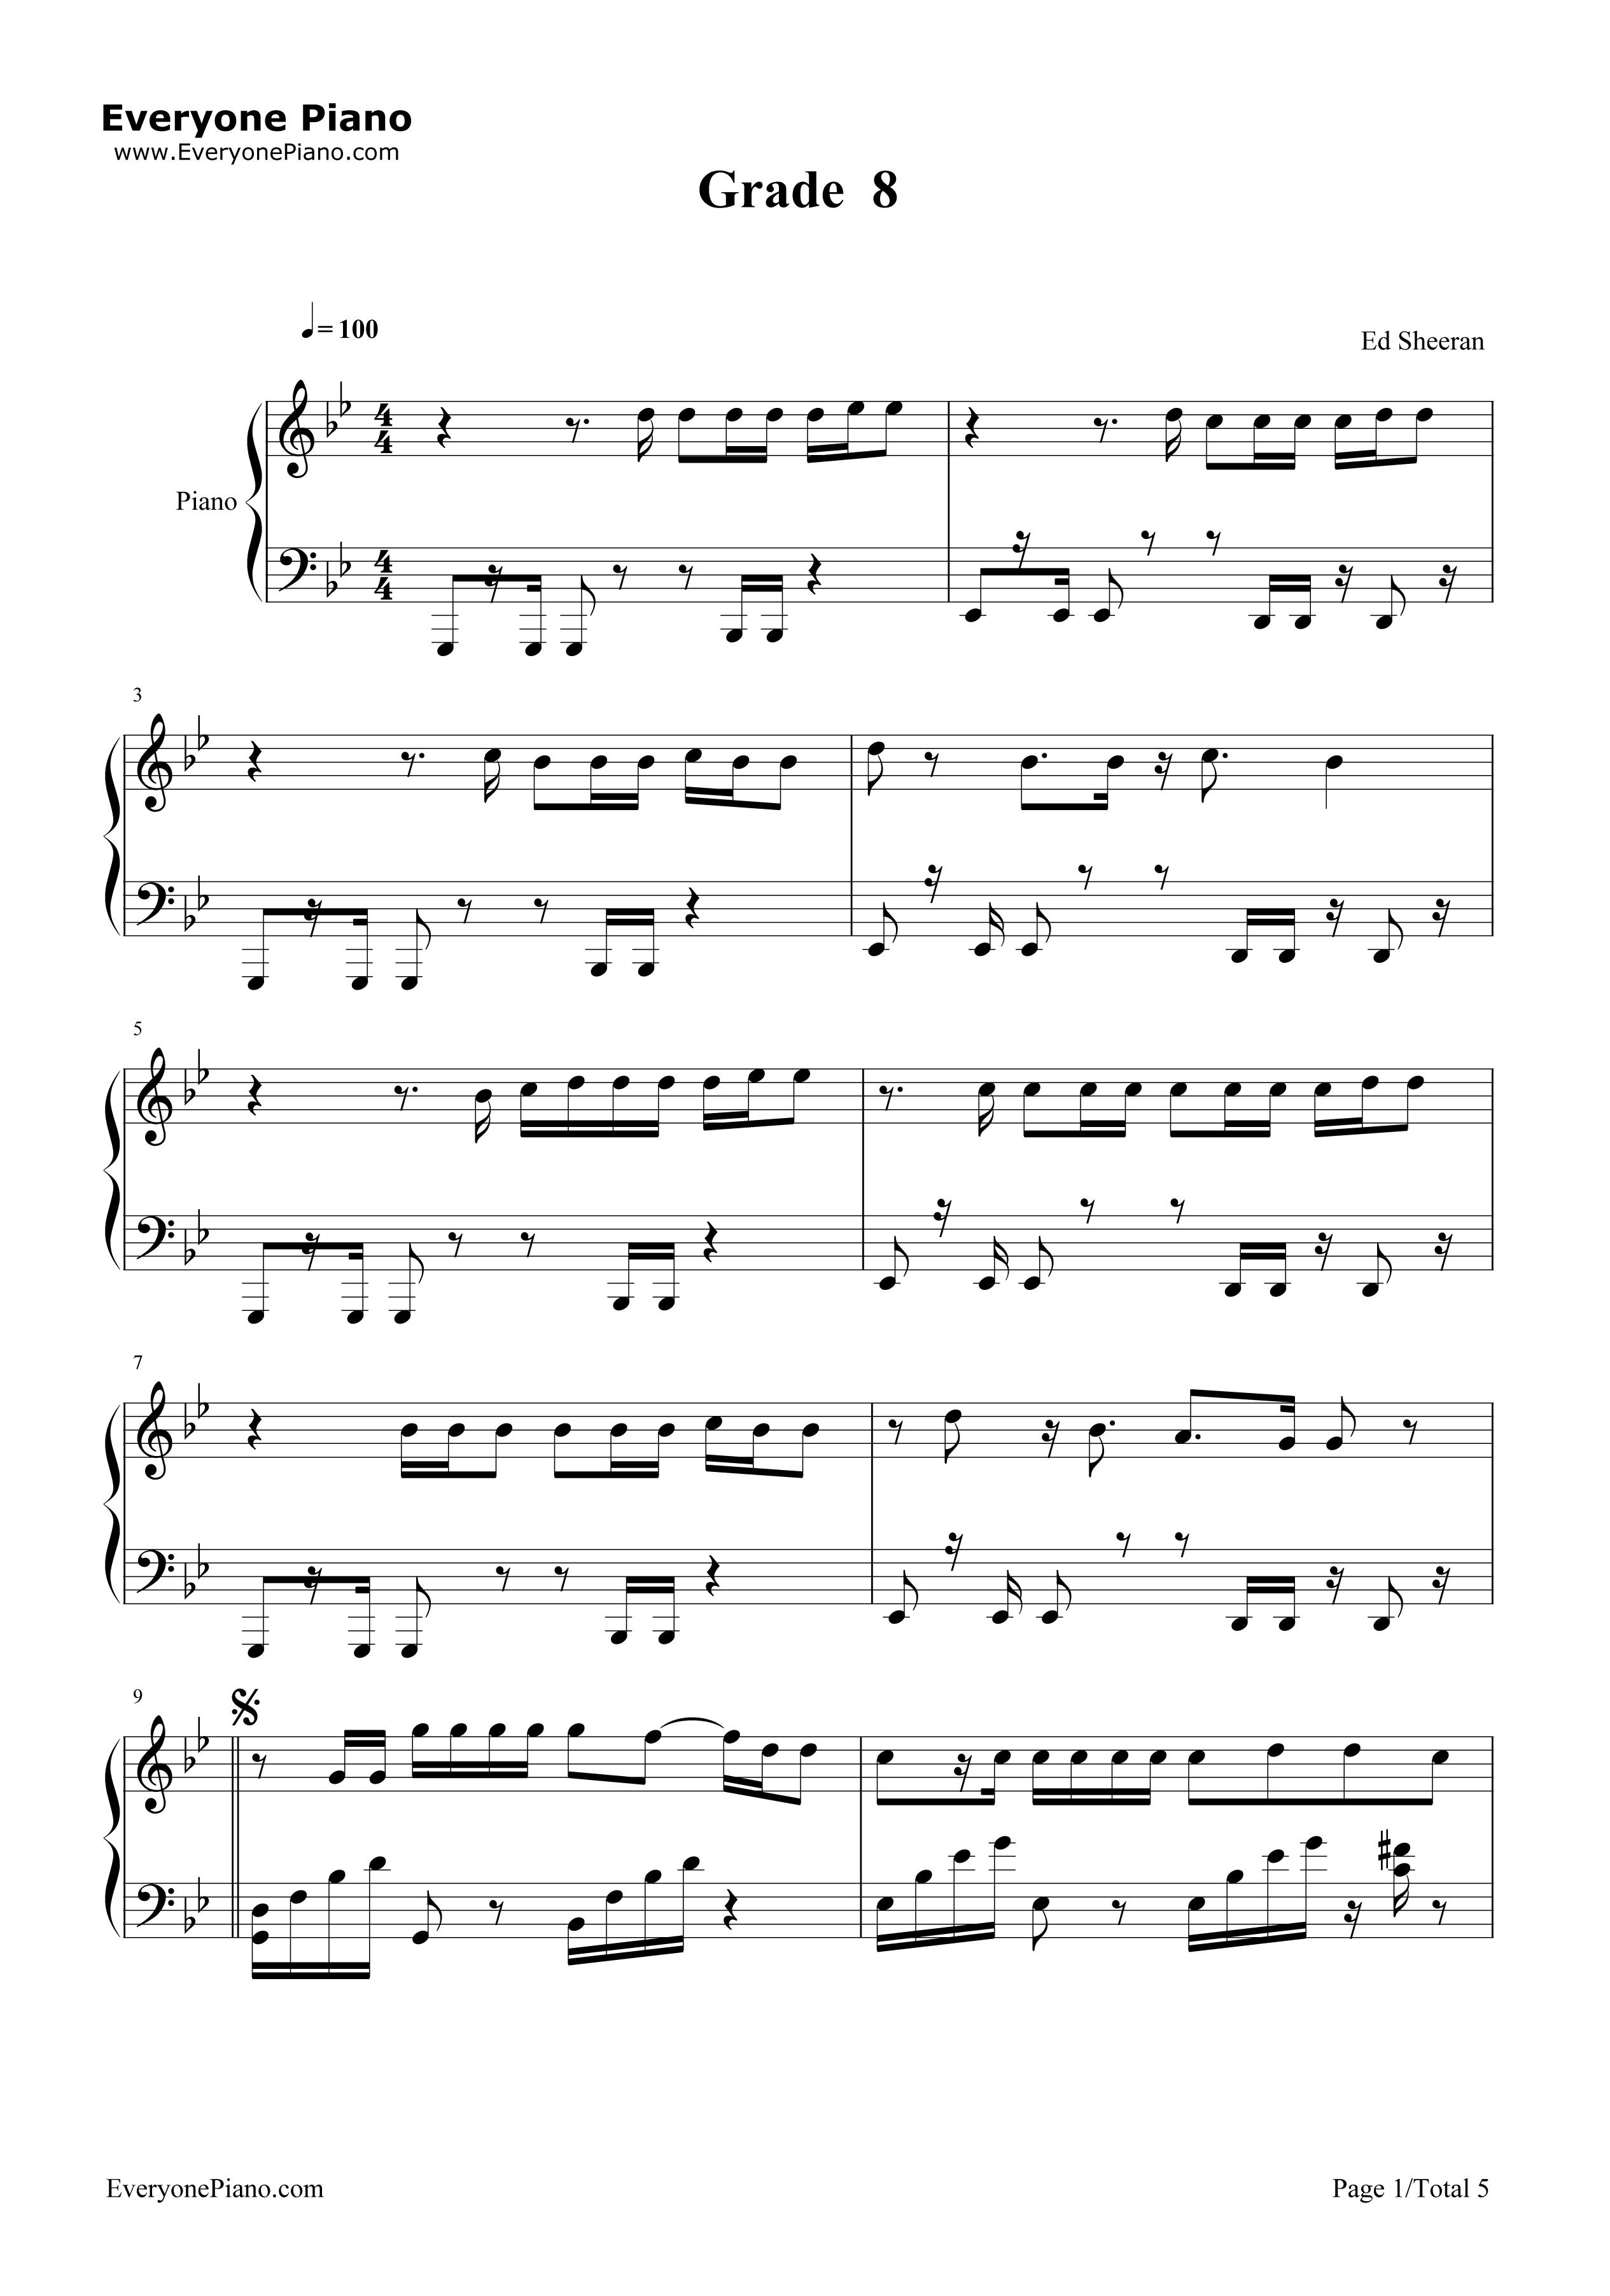 Grade 8 ed sheeran free piano sheet music piano chords grade 8 ed sheeran stave preview 1 hexwebz Images